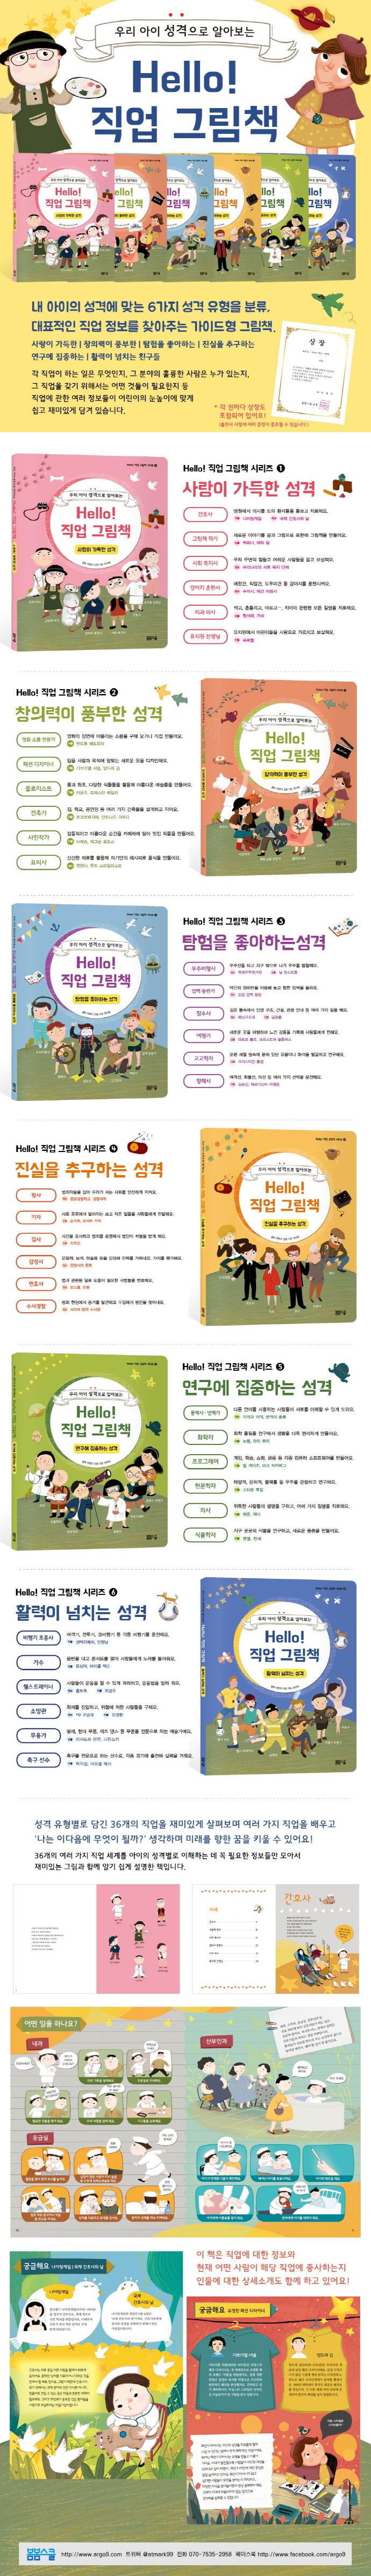 Hello! 직업 그림책: 창의력이 풍부한 성격(우리 아이 성격으로 알아보는)(Hello! 직업 그림책 시리즈 2)(? 도서 상세이미지